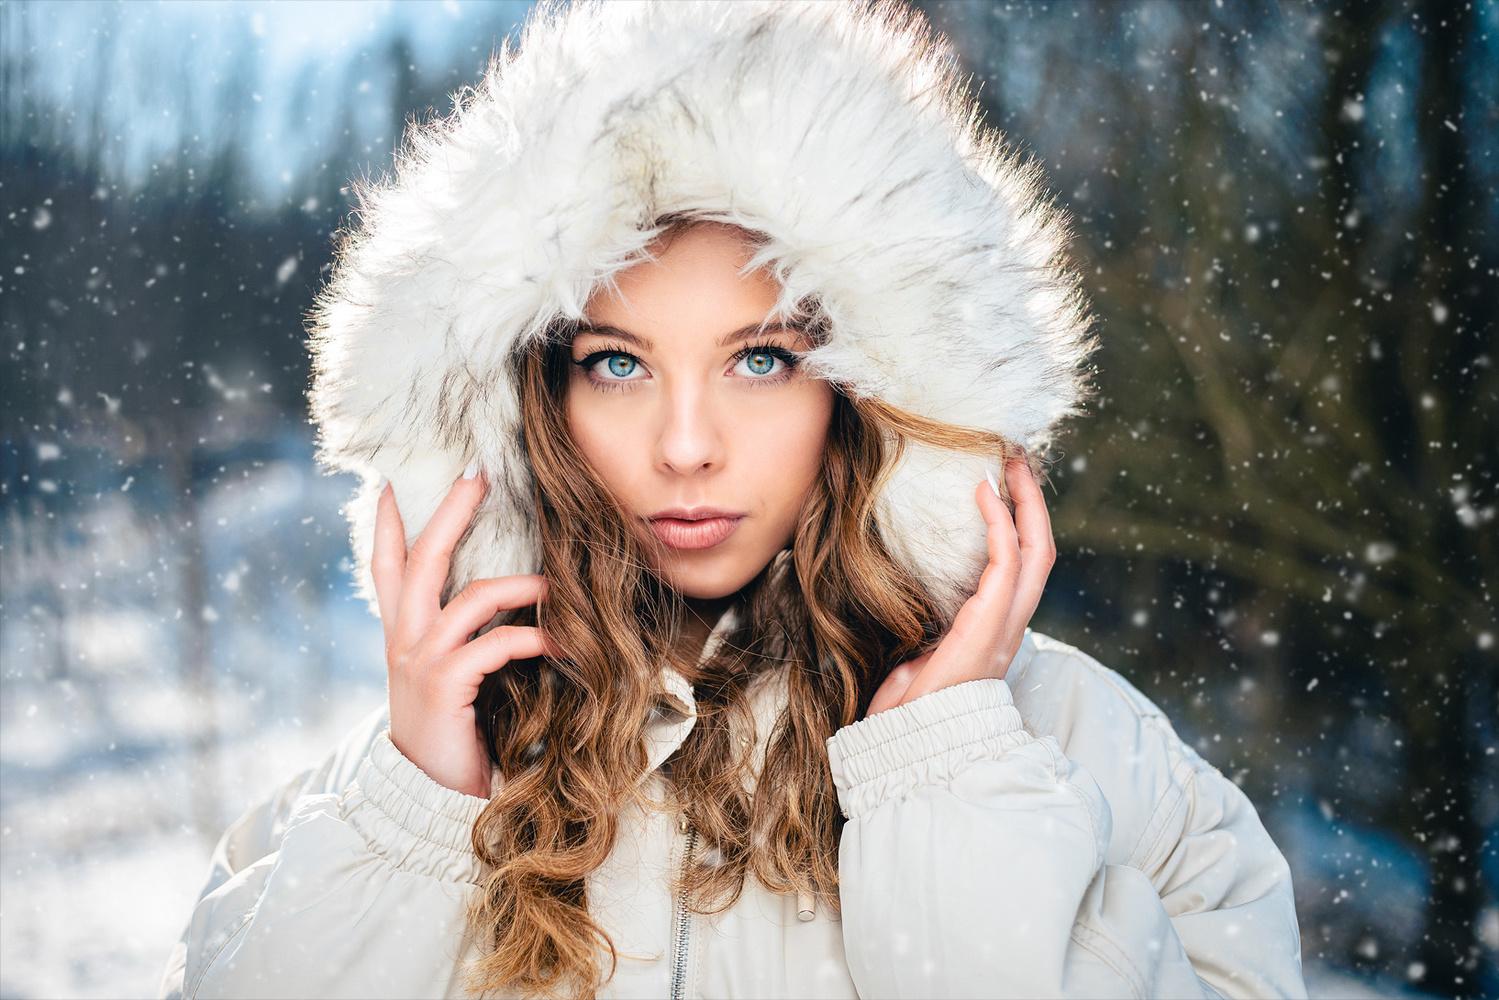 Blue eyes in the snow by Lennart Böwering